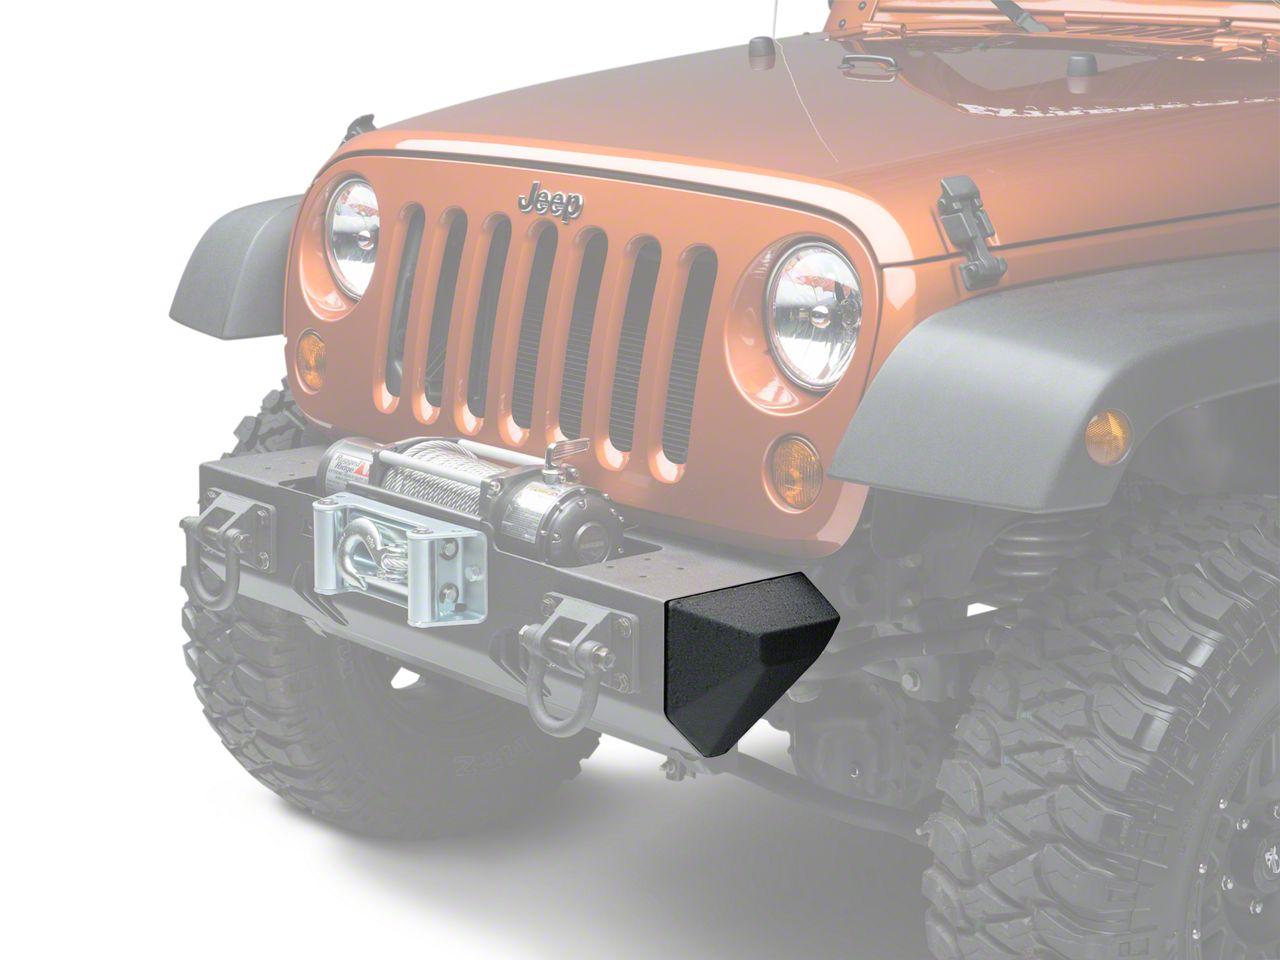 Add Rugged Ridge Bumper Ends for XHD Front Bumper - Textured Black (07-17 Wrangler JK)